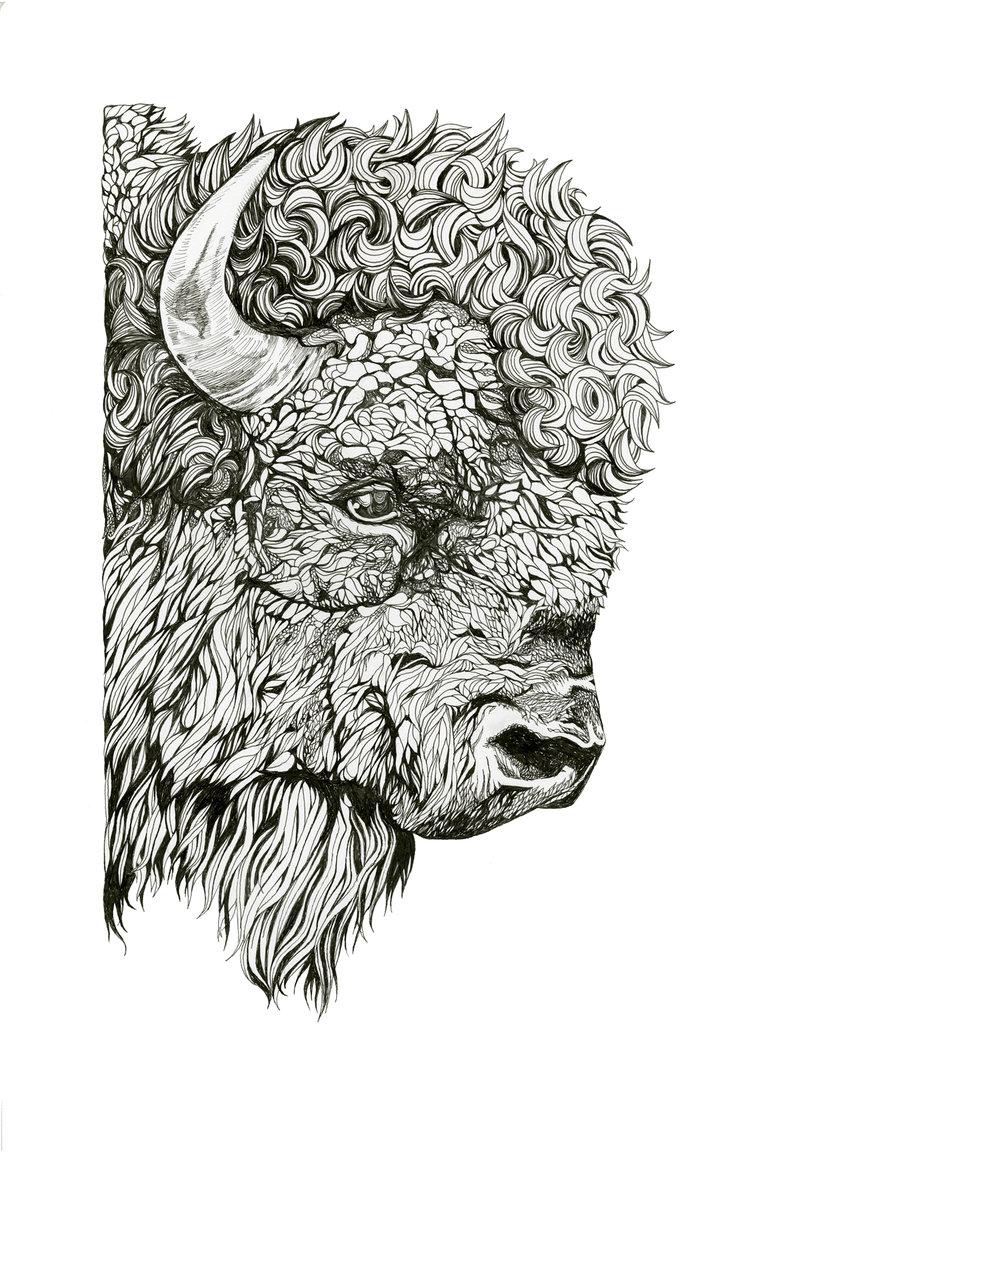 Bison Bison Bison - 19 X 14.5felt-tipped pen on bristol paperprints available on request